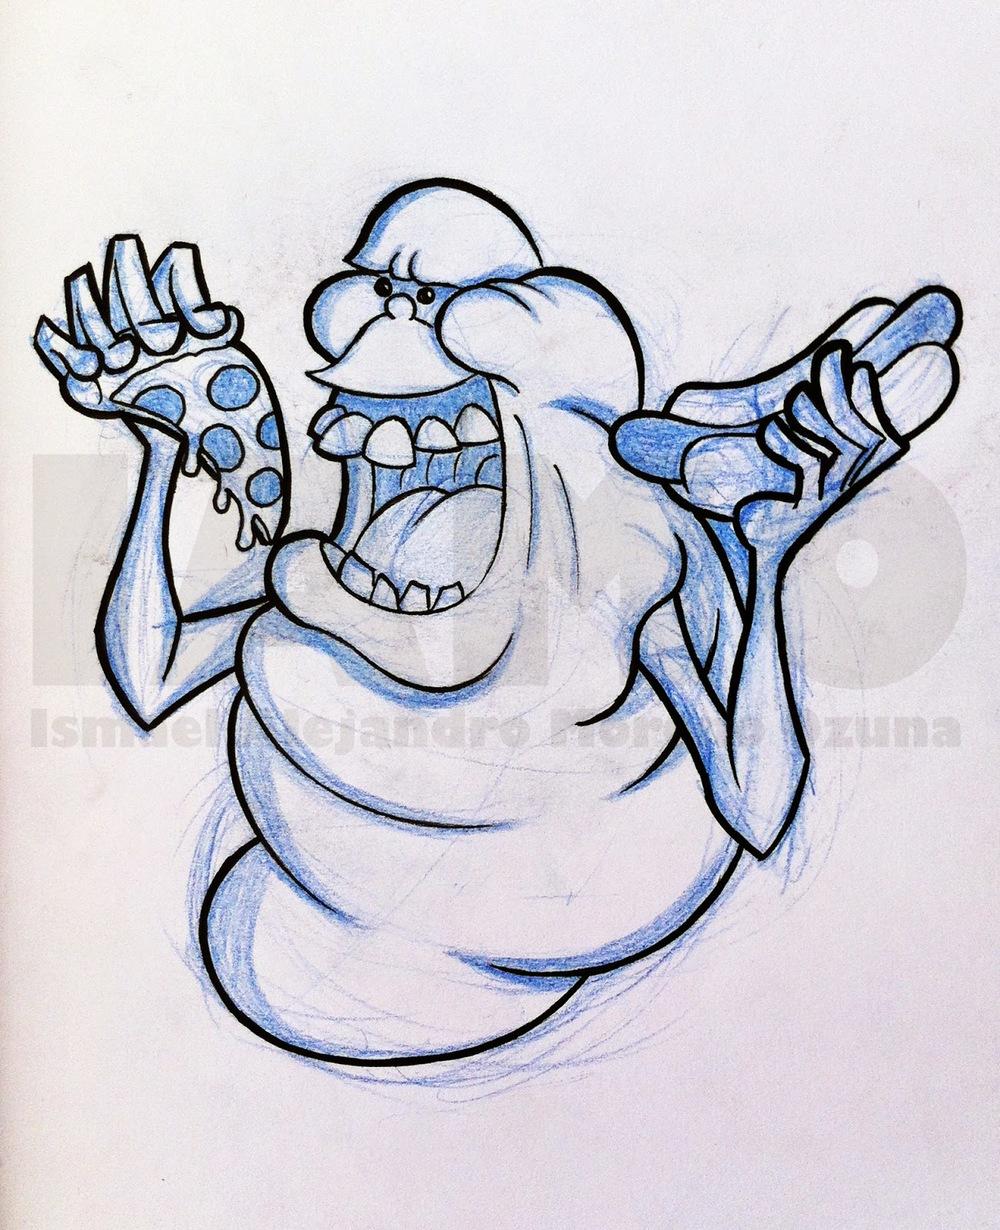 IAMO slimer ghostbusters sketch